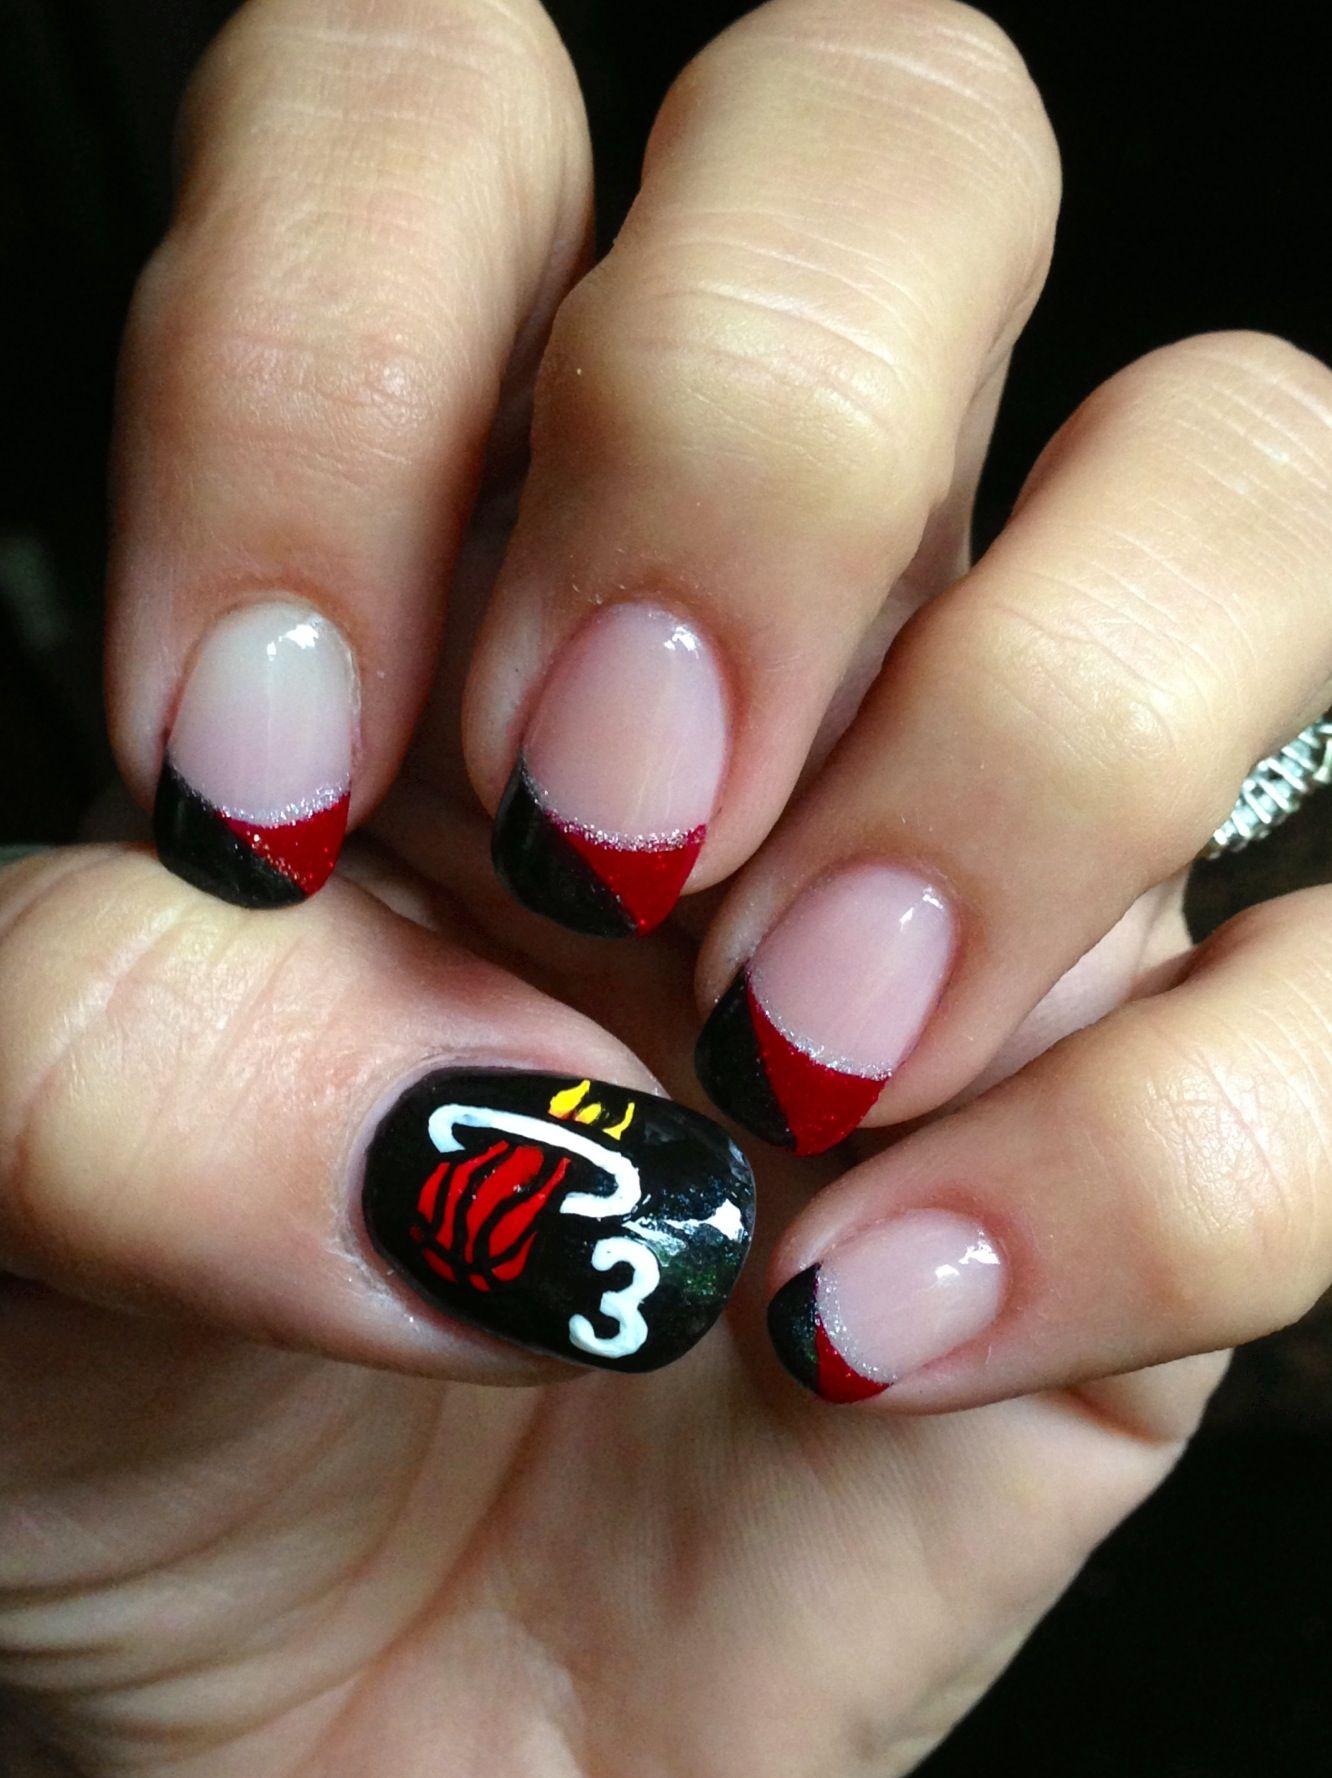 Miami Heat mani. Awesome mani! Wade baby...3!! Nails